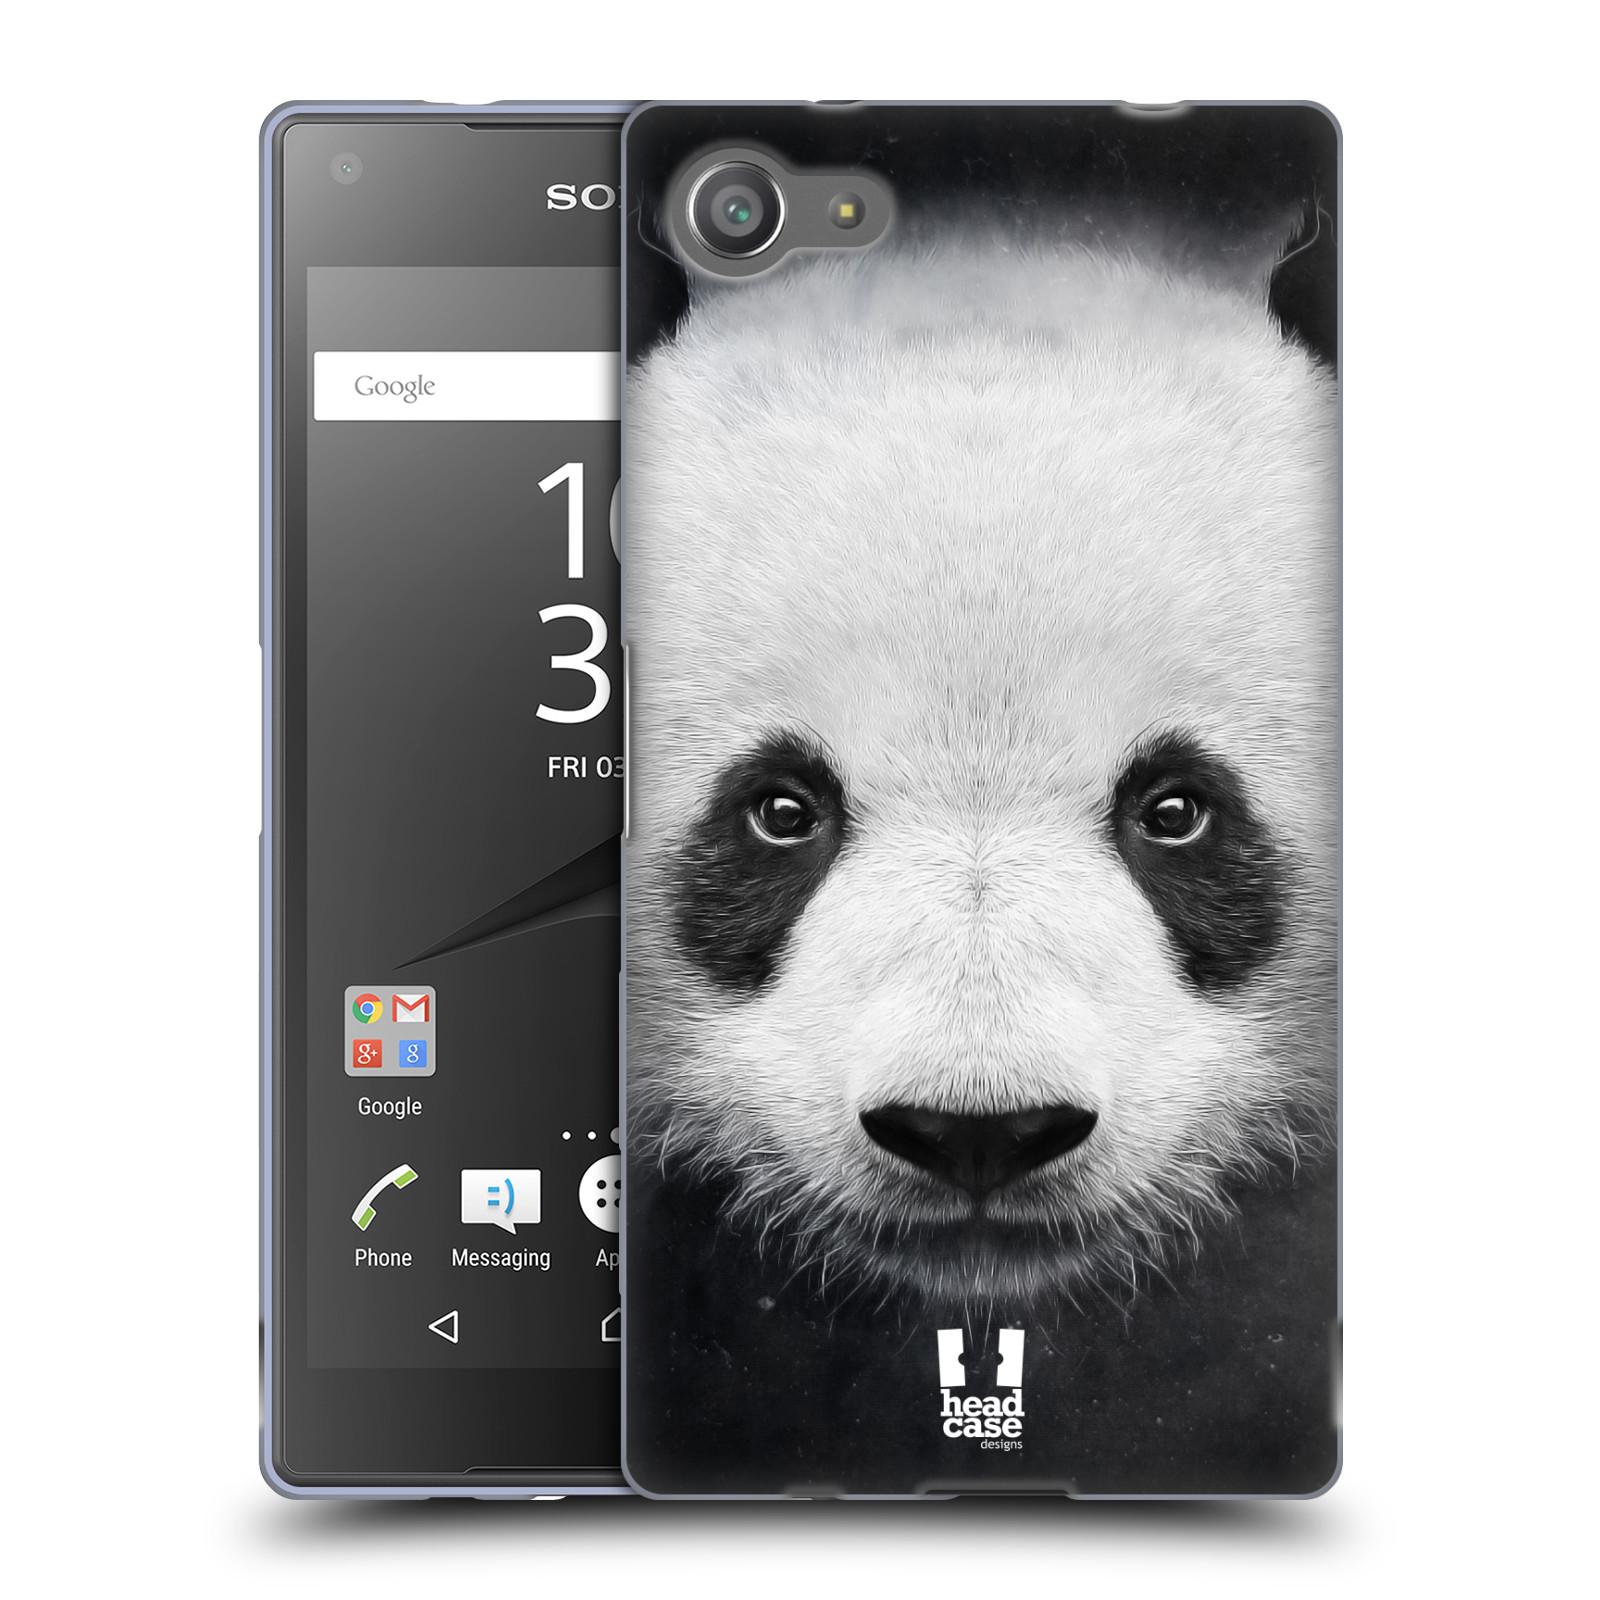 HEAD CASE silikonový obal na mobil Sony Xperia Z5 COMPACT vzor Zvířecí tváře medvěd panda